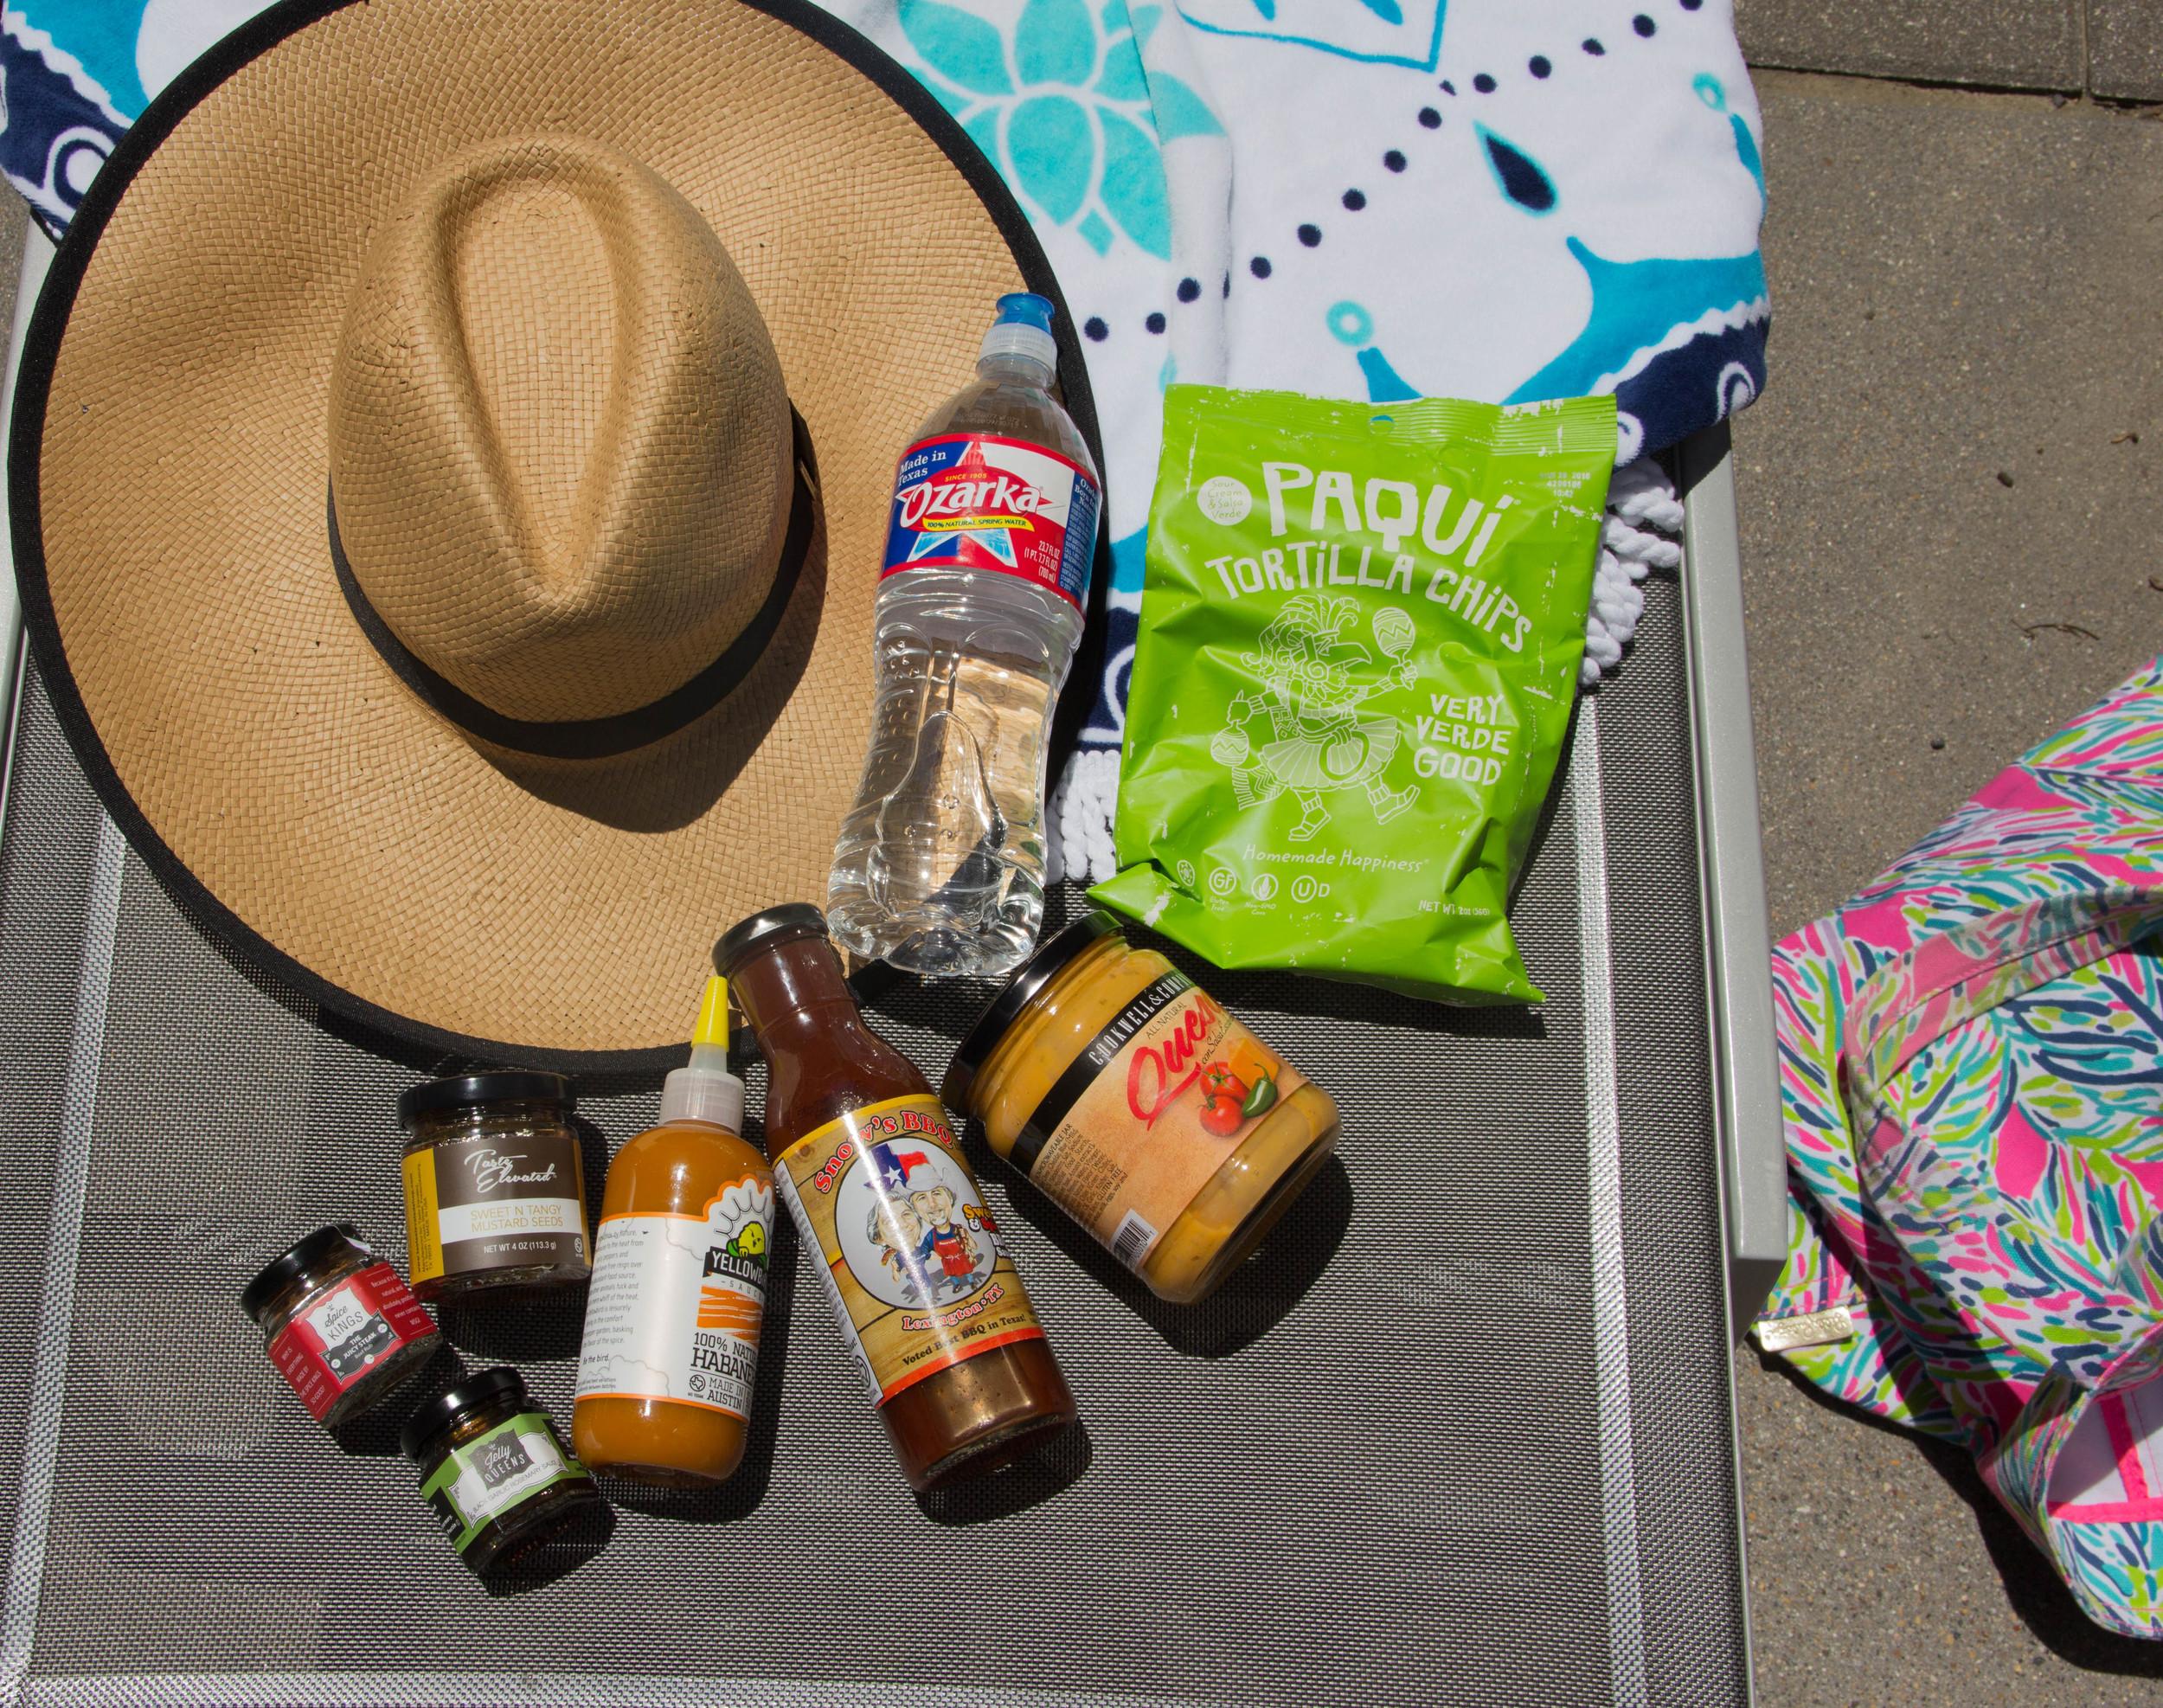 ozara, texas, for here by here, karen walker dupes, target bikini, pool day